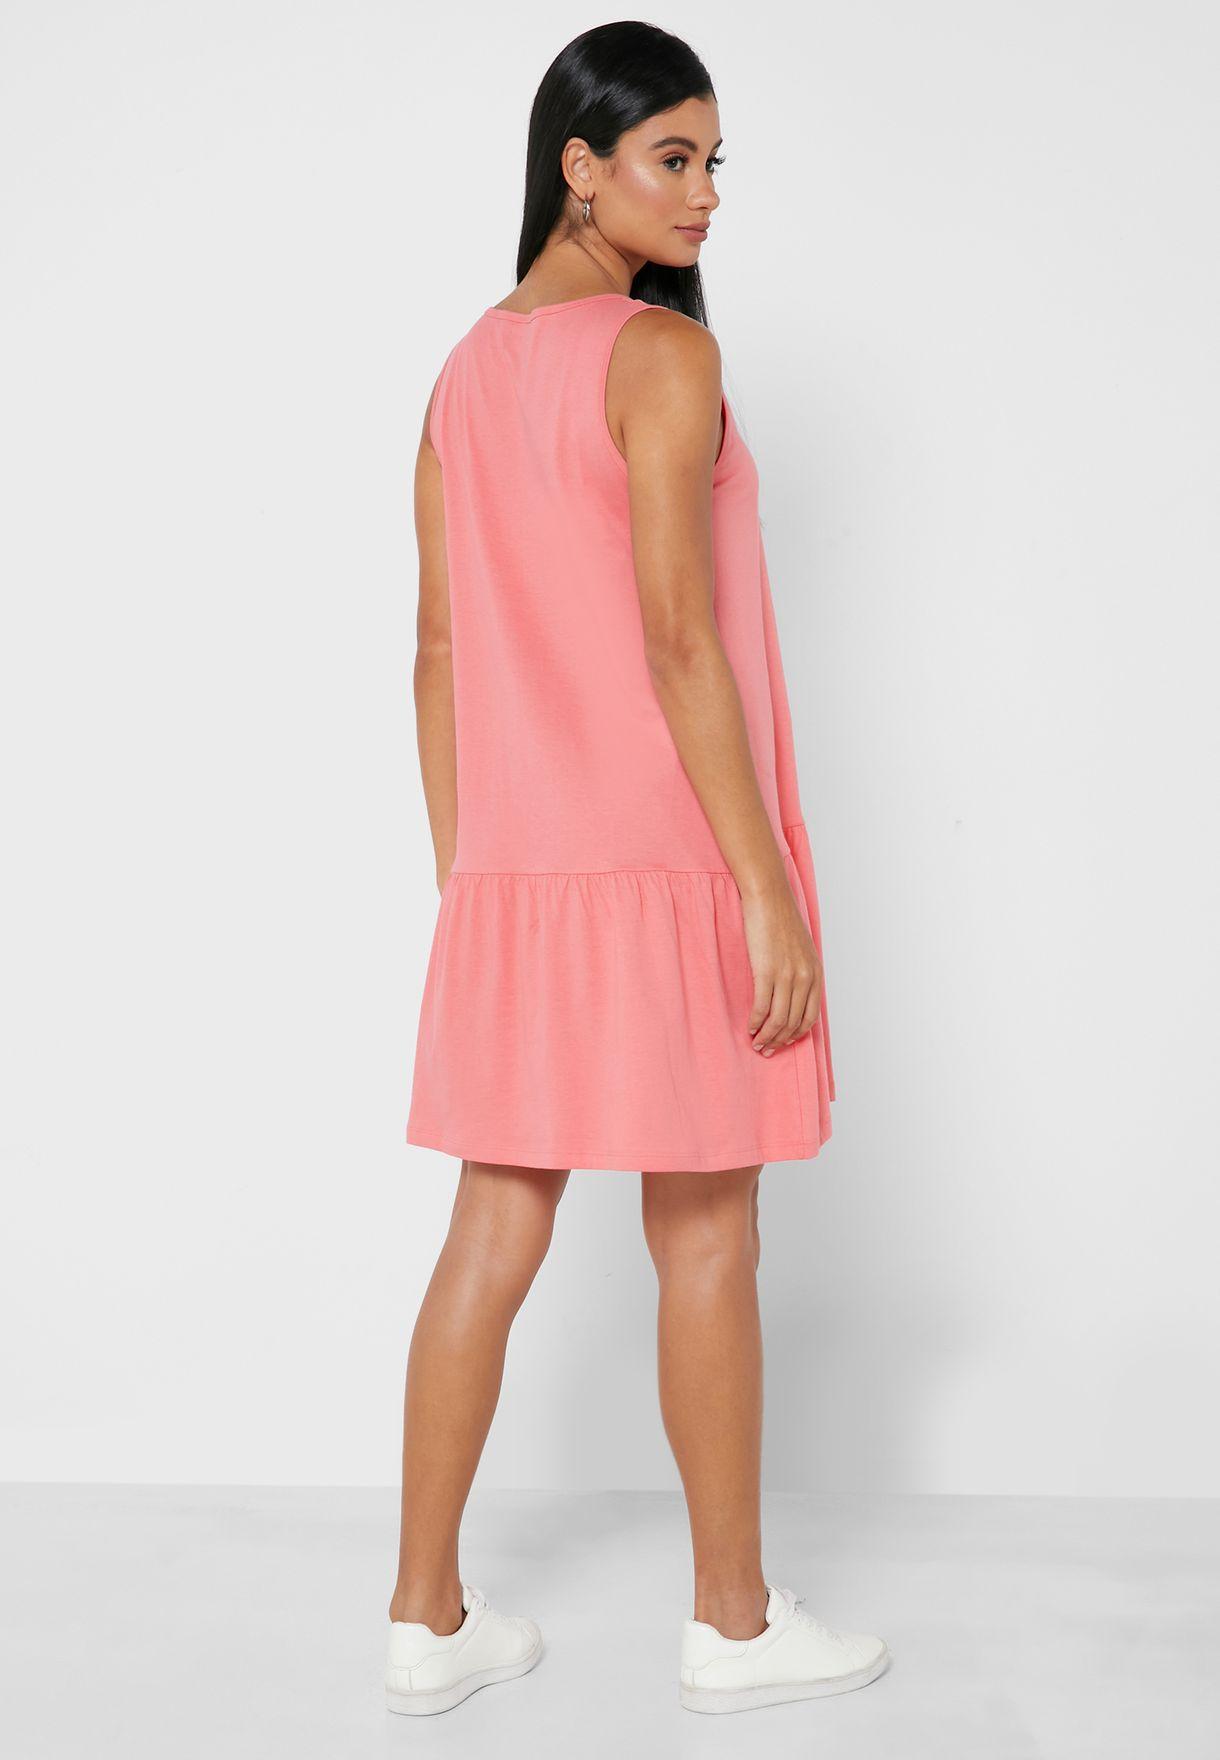 فستان قصير بحواف بيبلوم